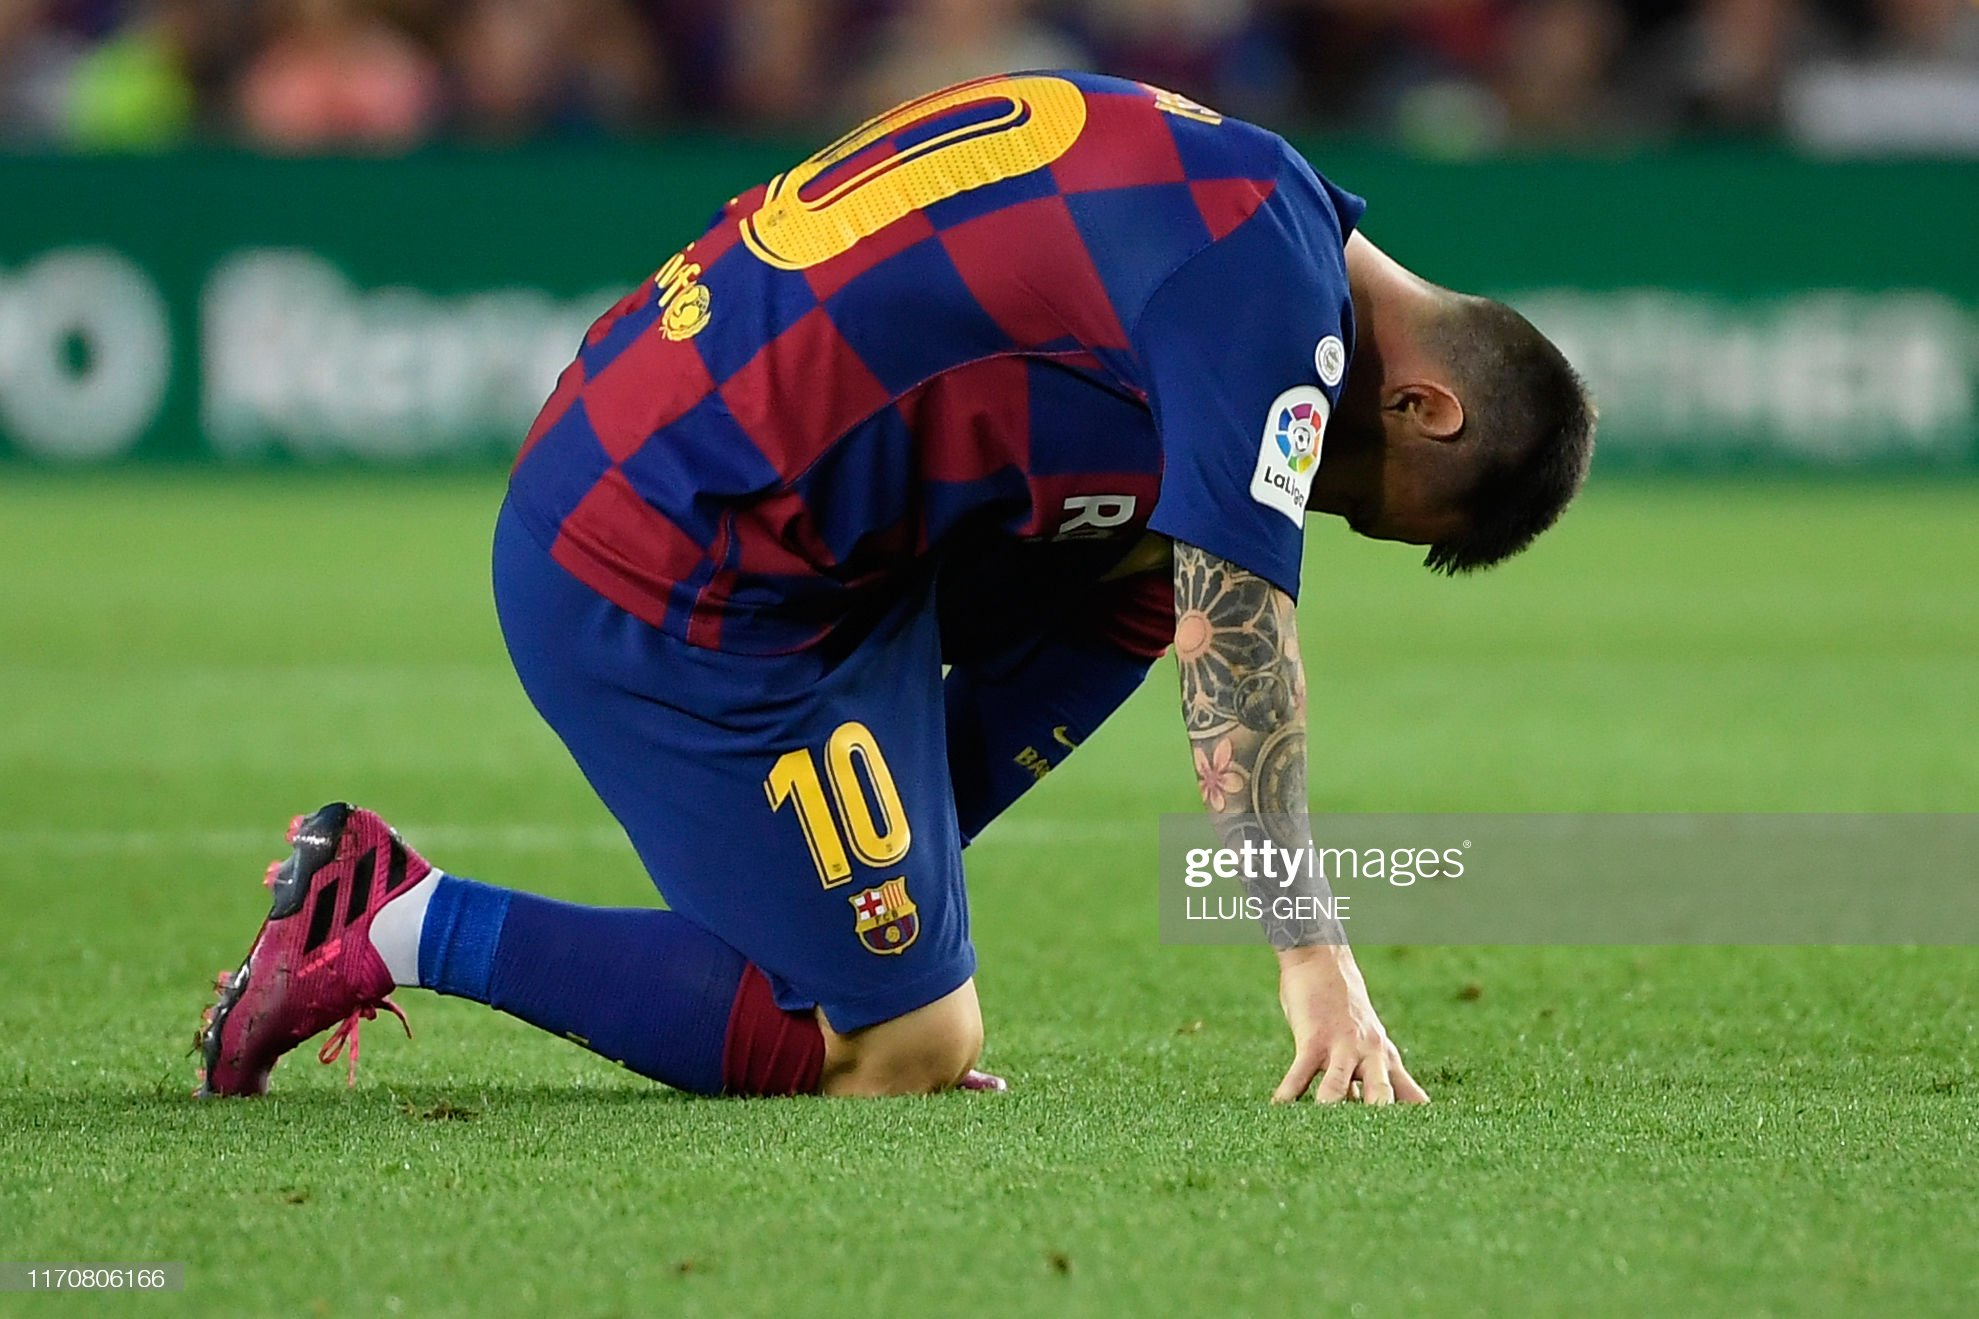 صور مباراة : برشلونة - فياريال 2-1 ( 24-09-2019 )  Barcelonas-argentine-forward-lionel-messi-reacts-on-the-ground-during-picture-id1170806166?s=2048x2048